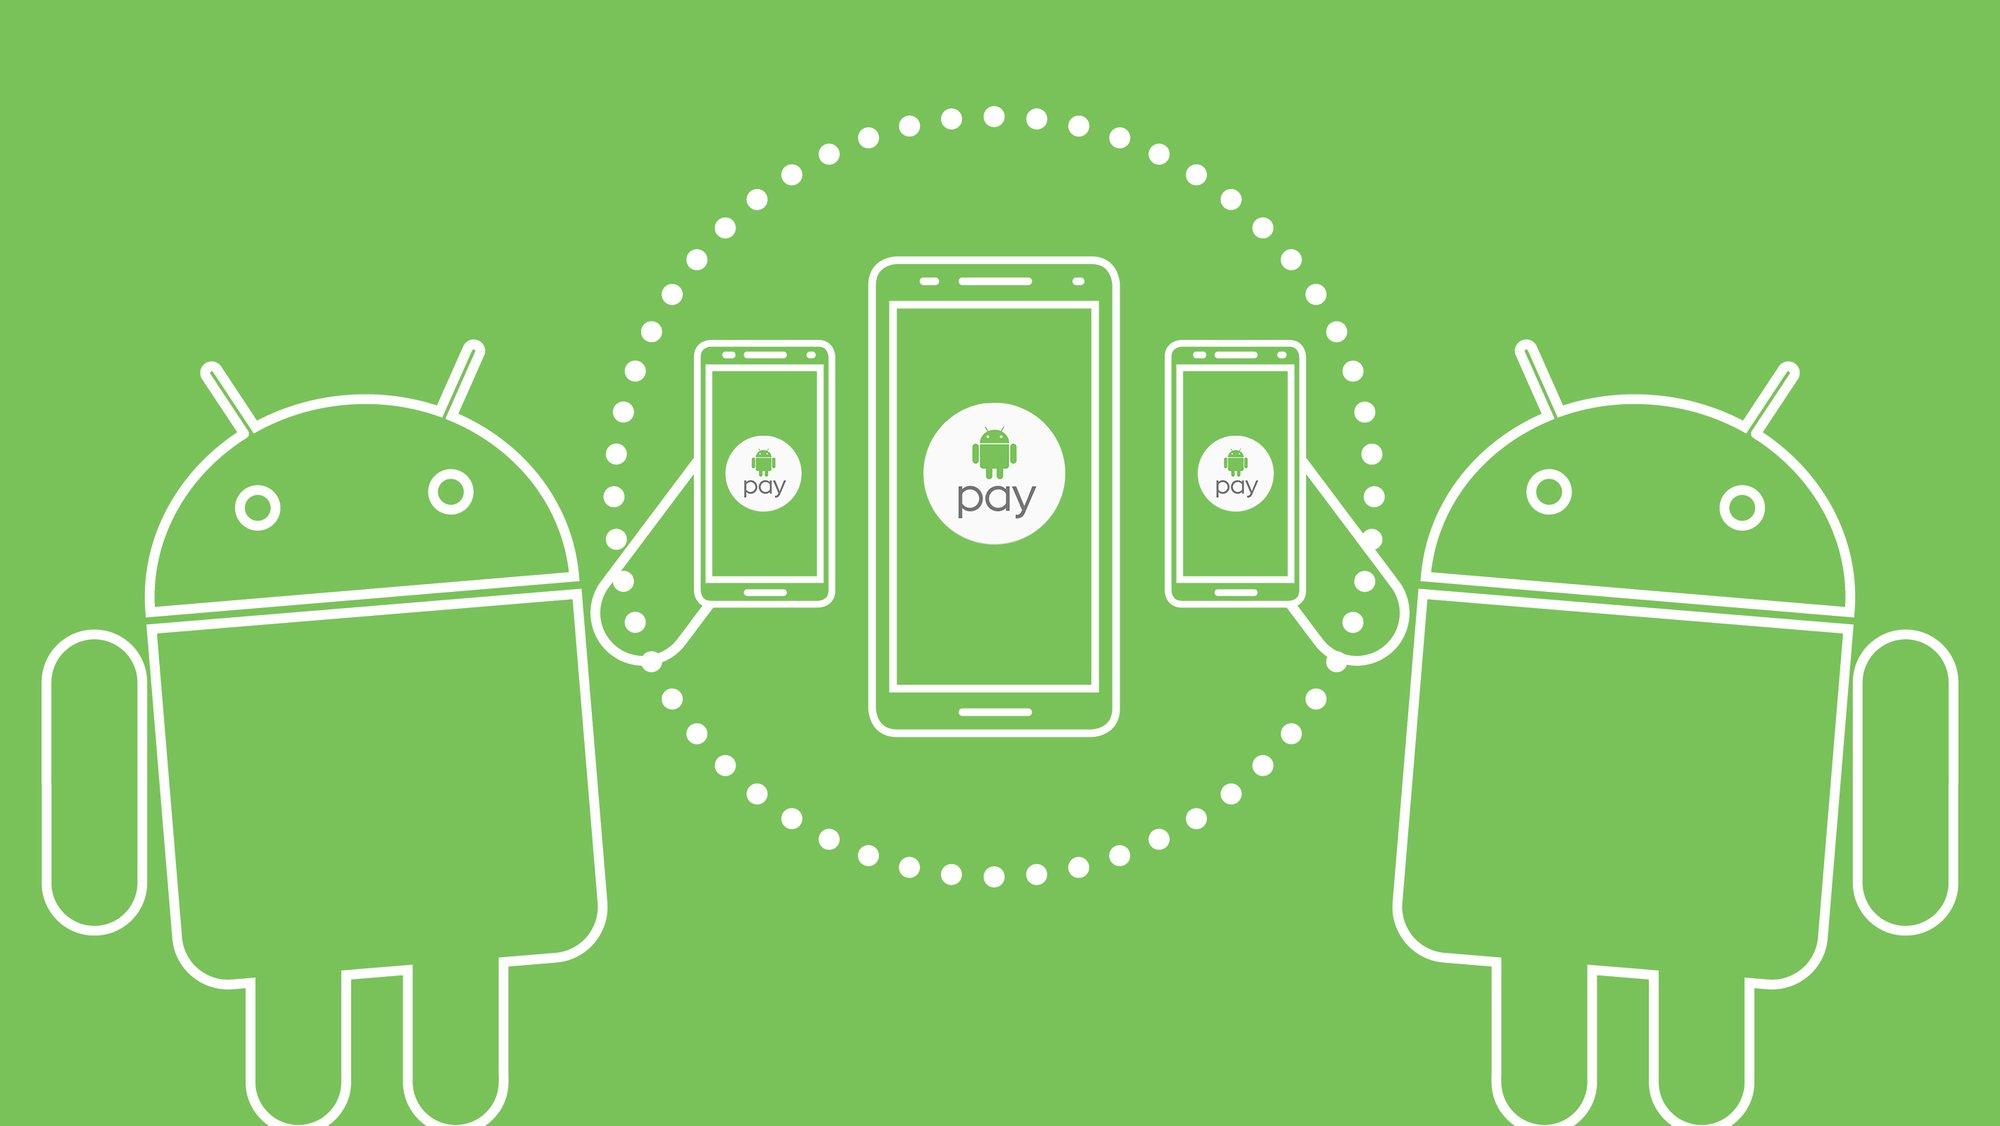 androidpay_banking-hero.jpg